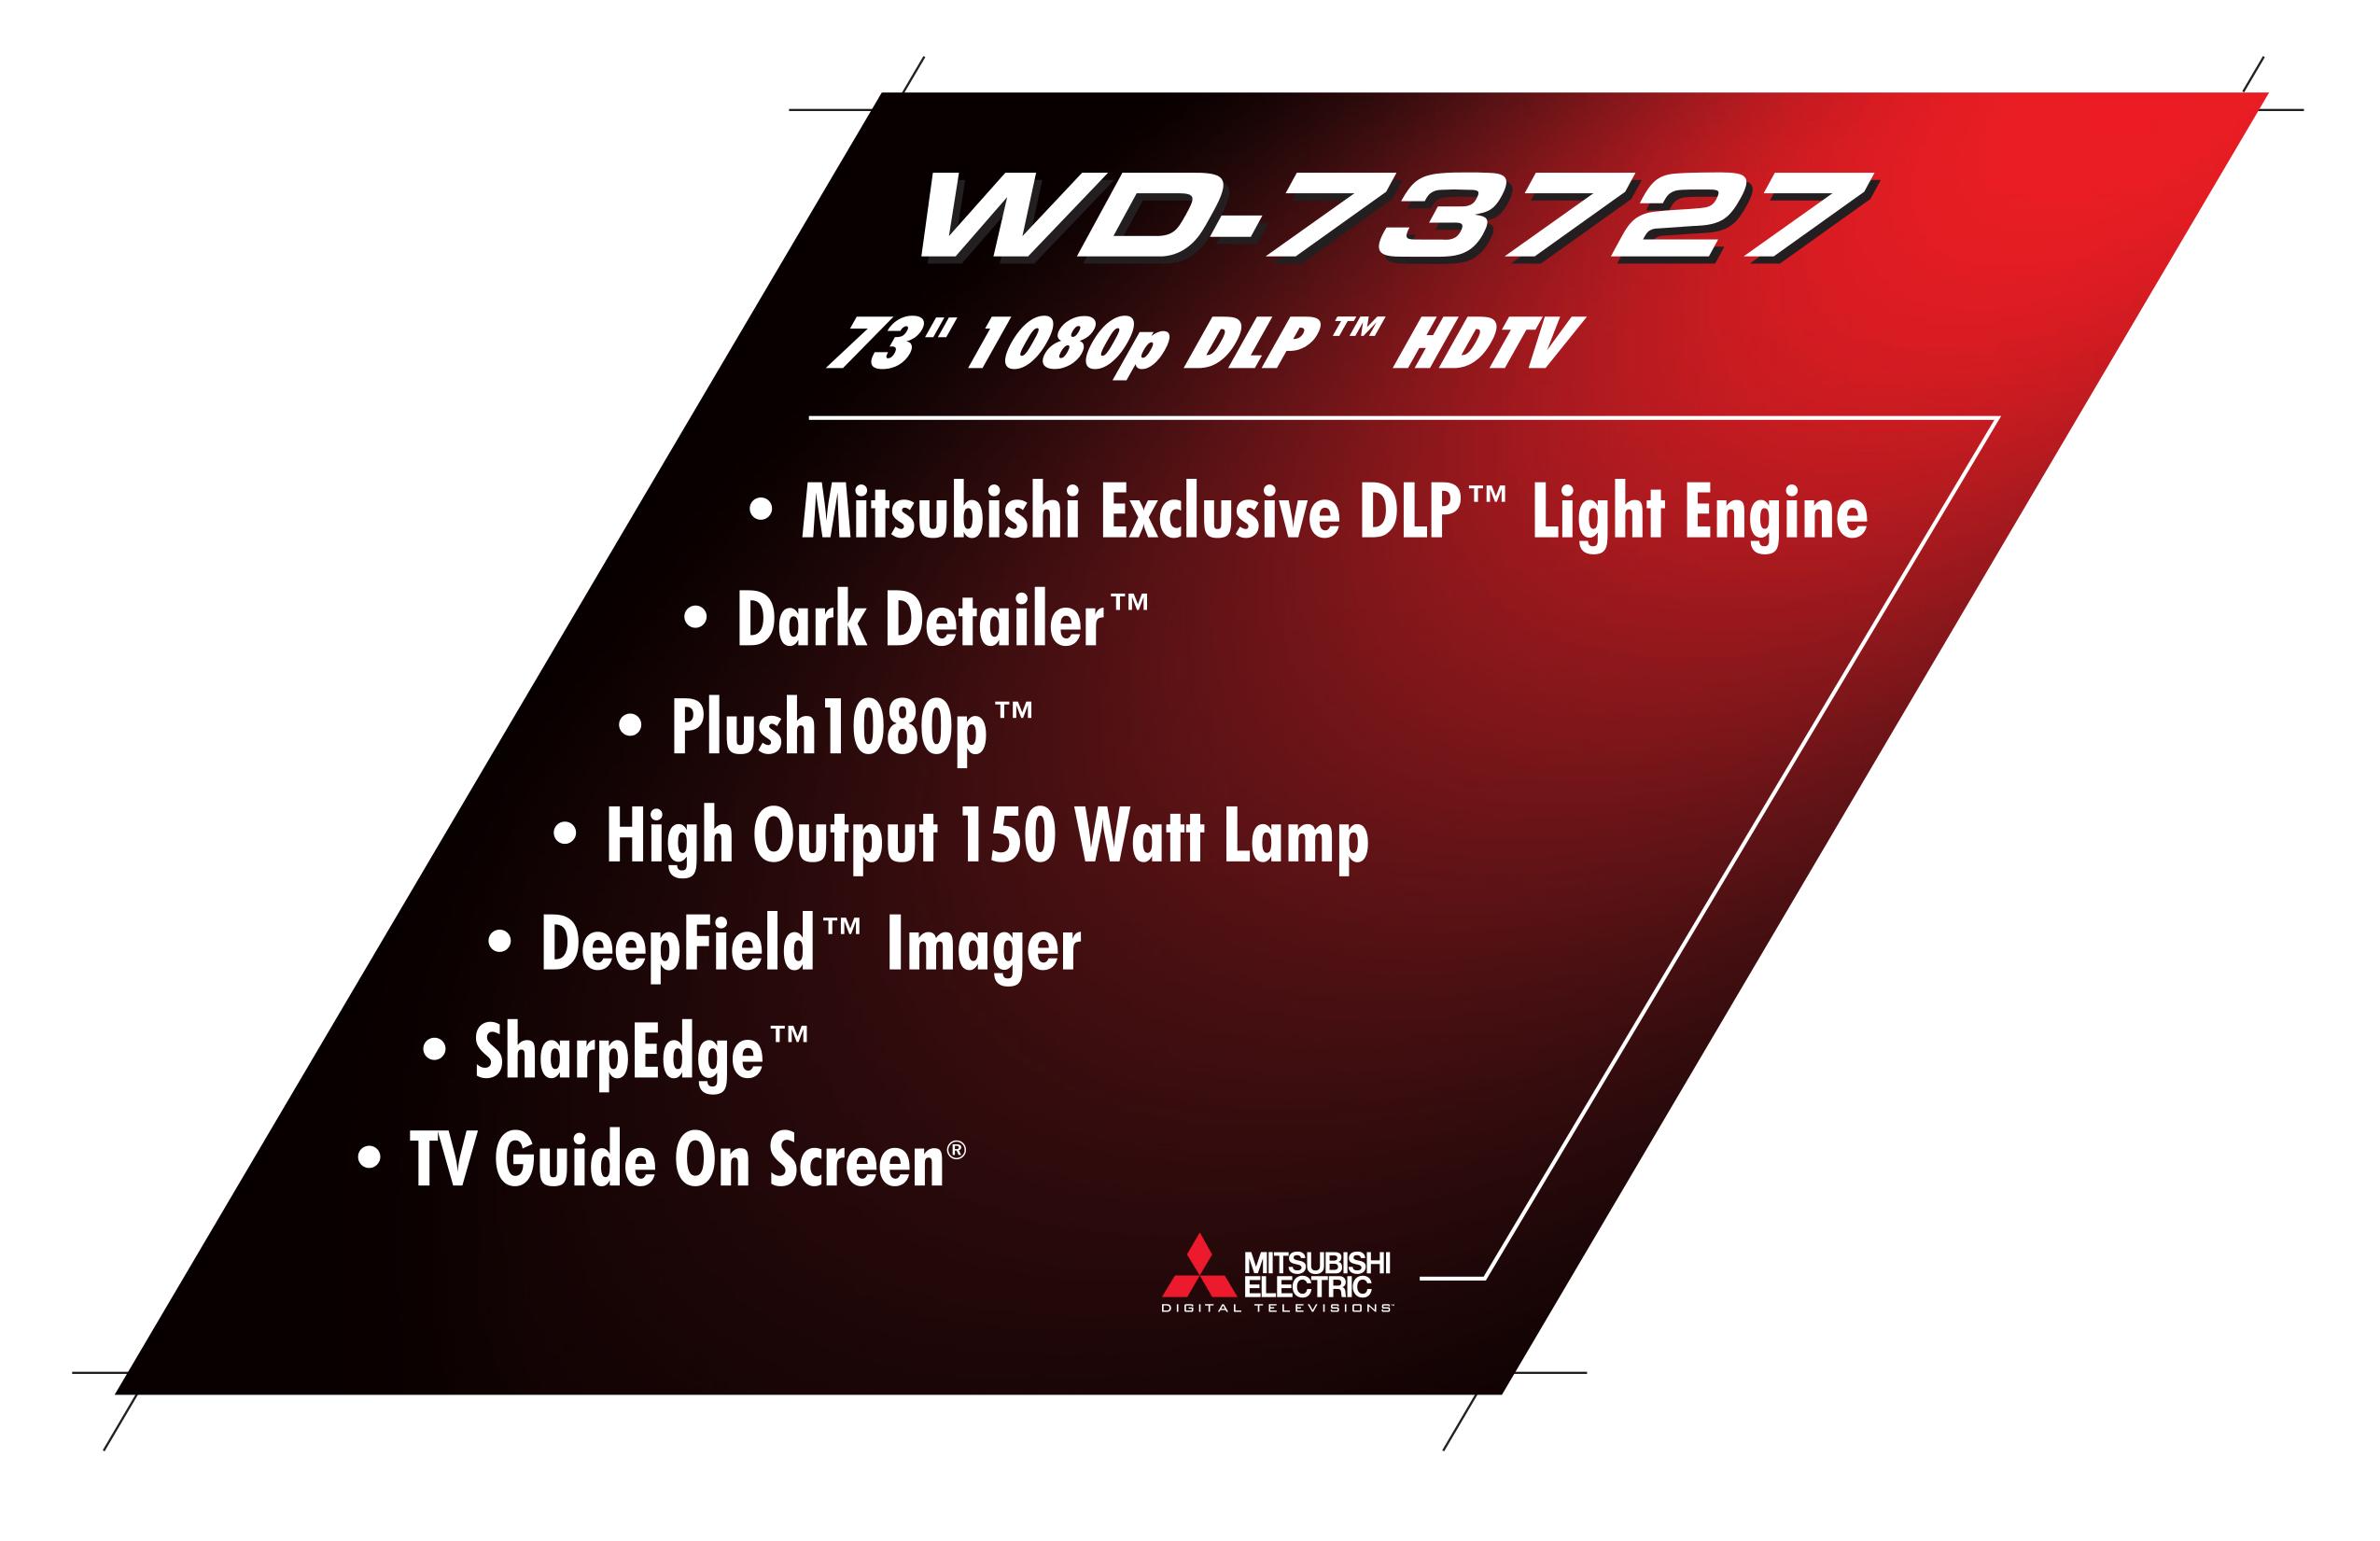 Pdf For Mitsubishi TV WD 73727 Manual